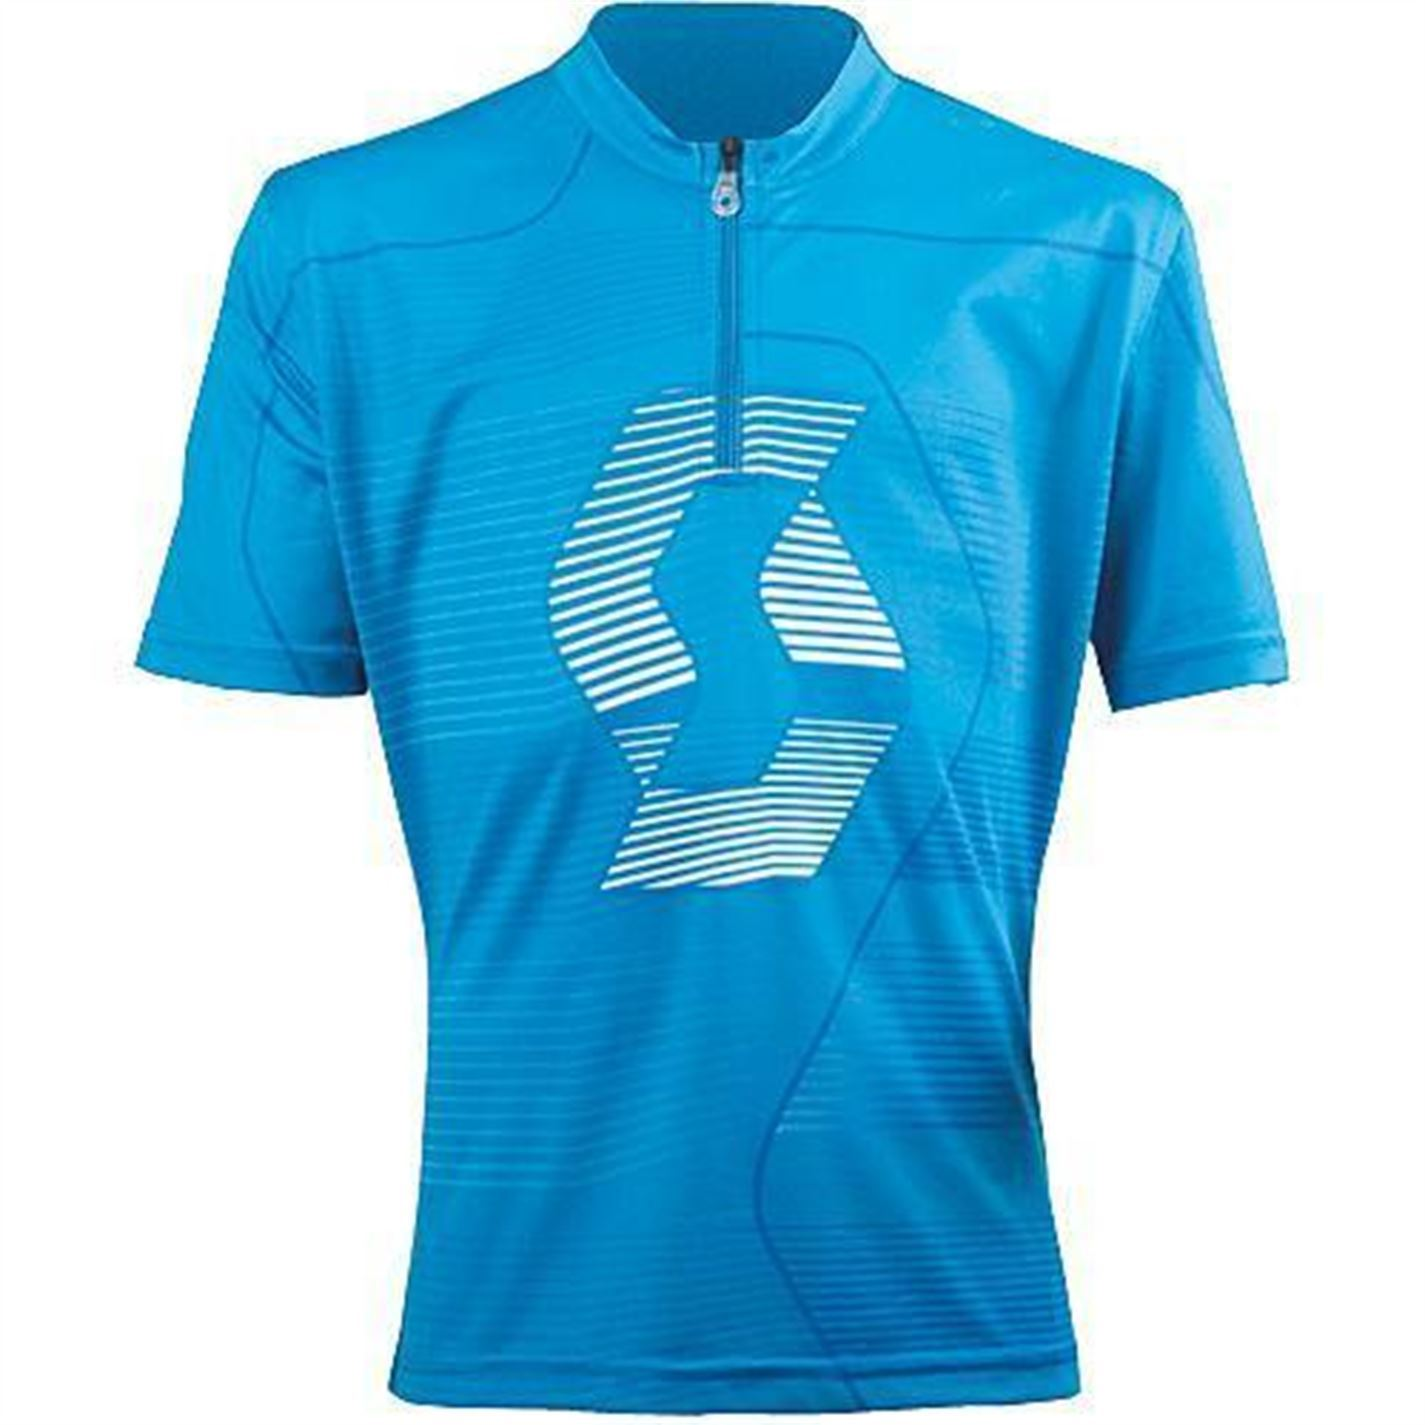 ... Juniors Jersey Short Sleeve Cycling T Shirt Tee Top Activewear | eBay